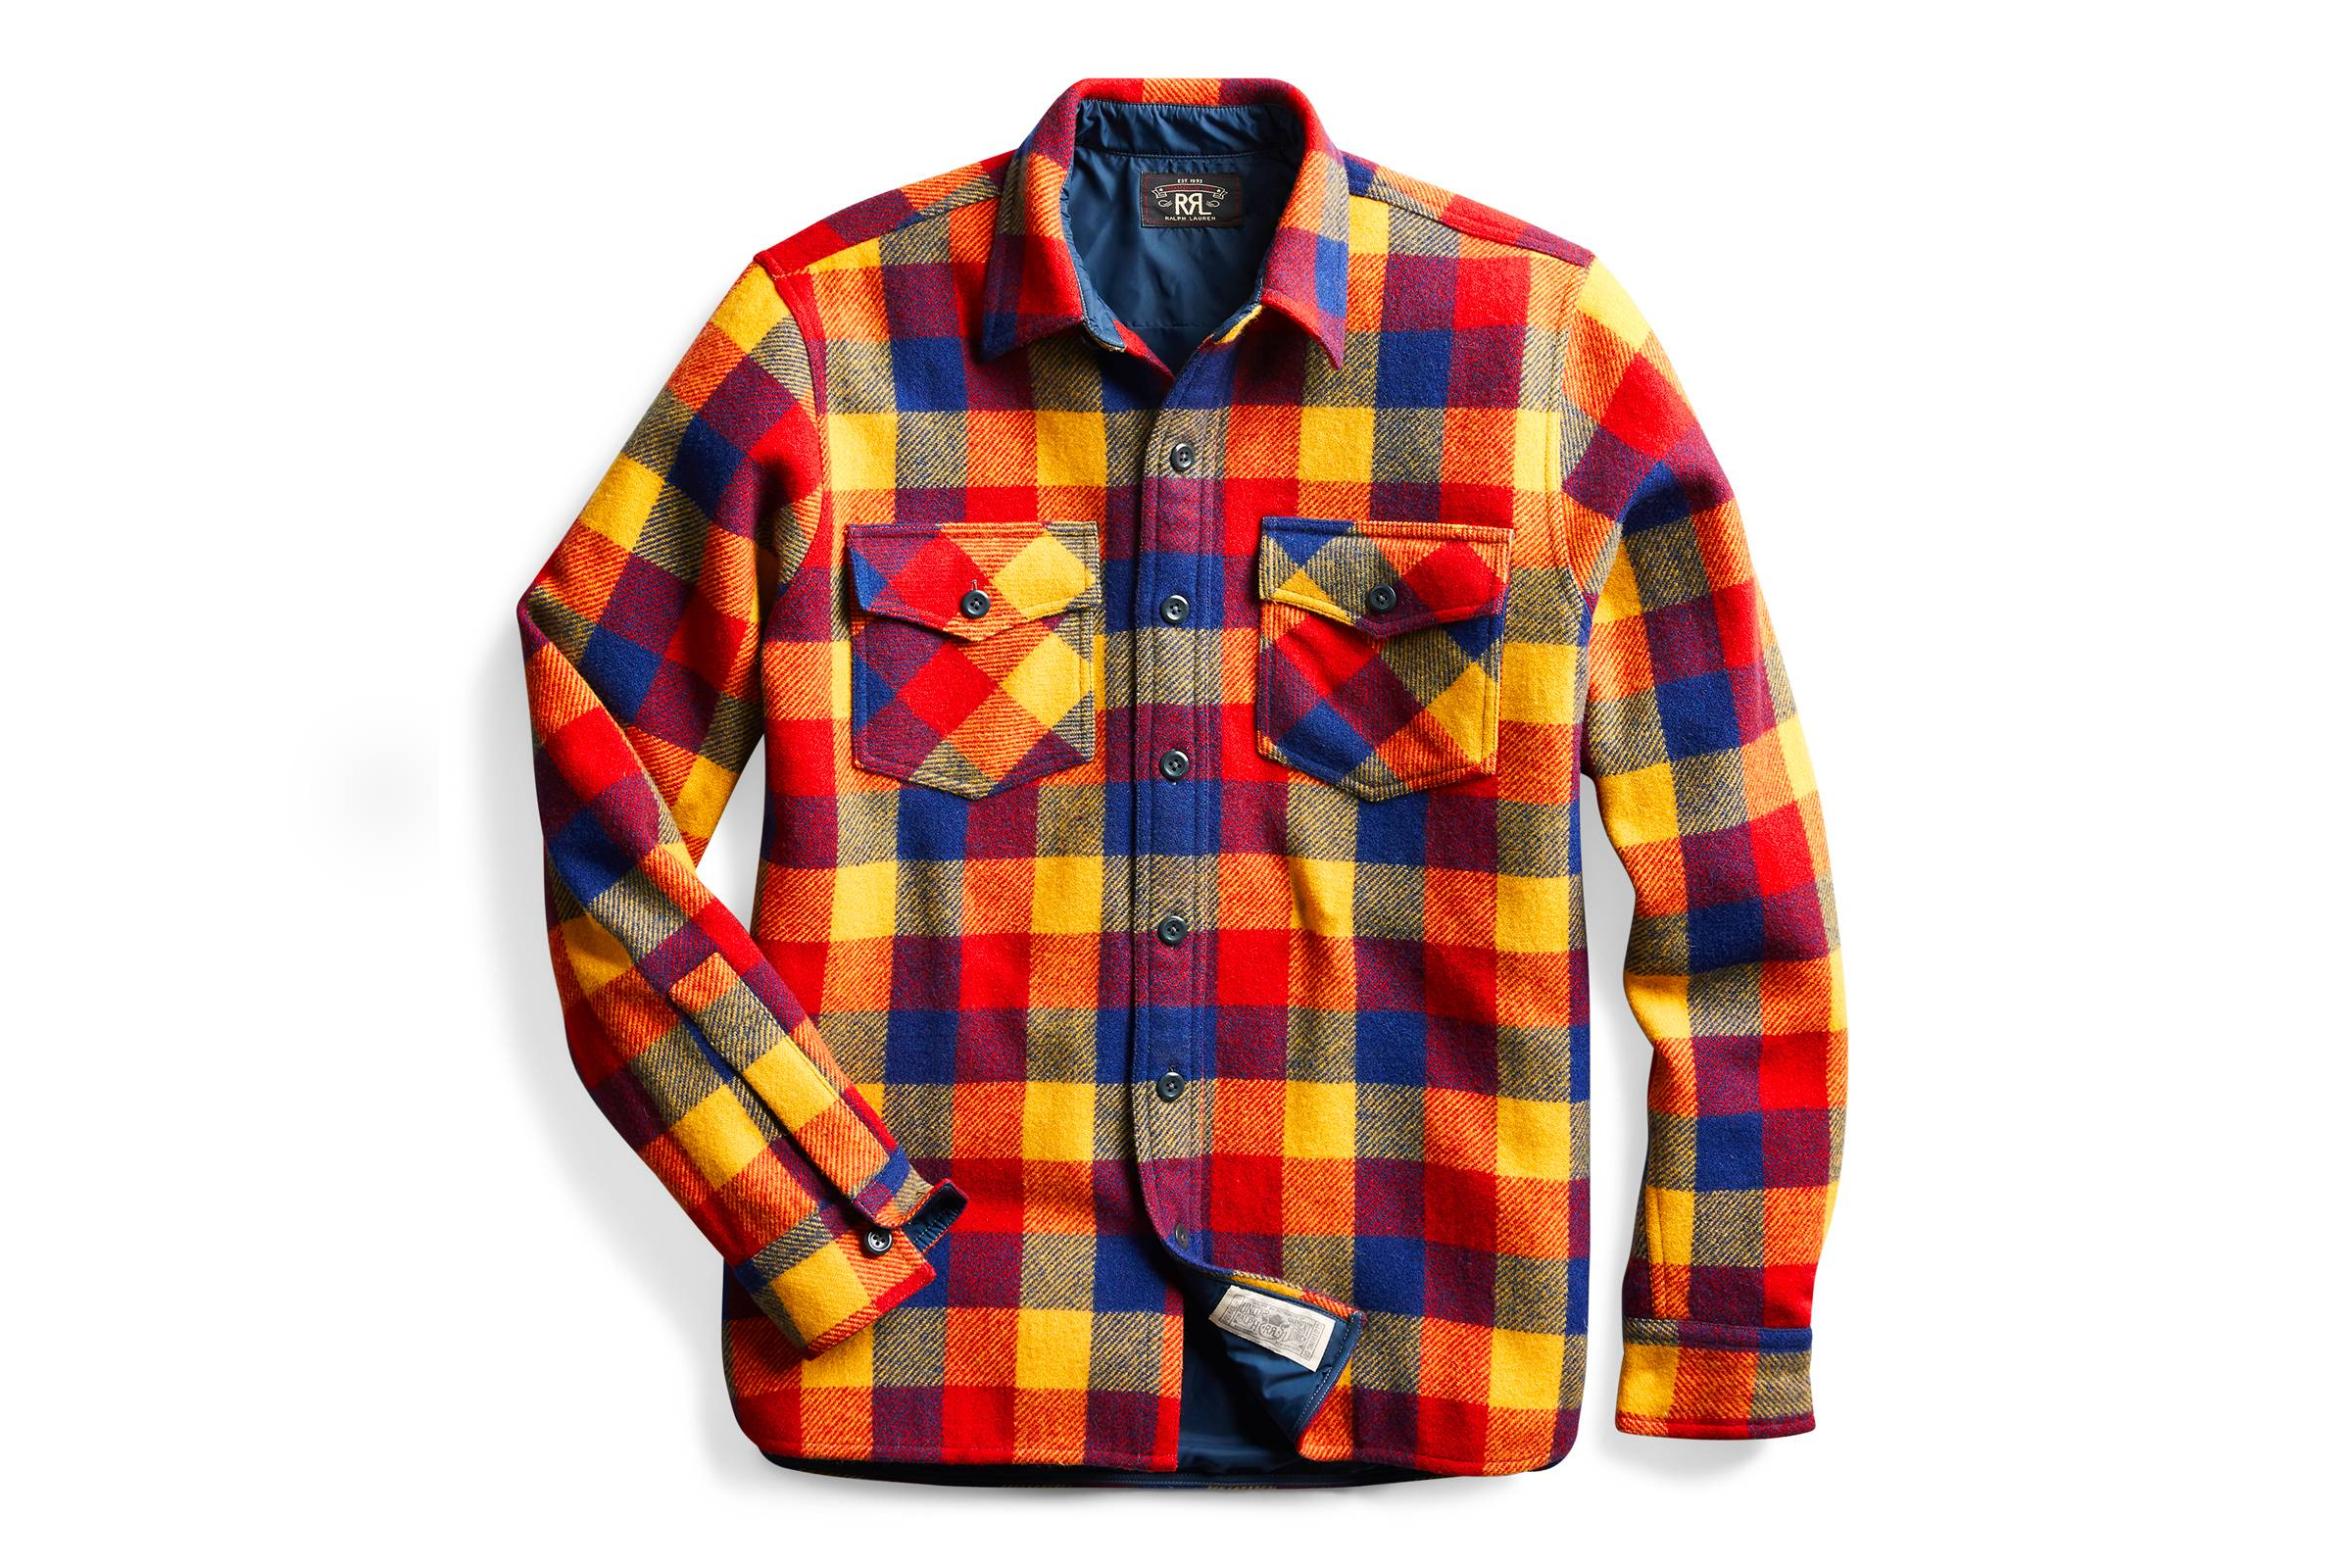 7. RRL Overshirt